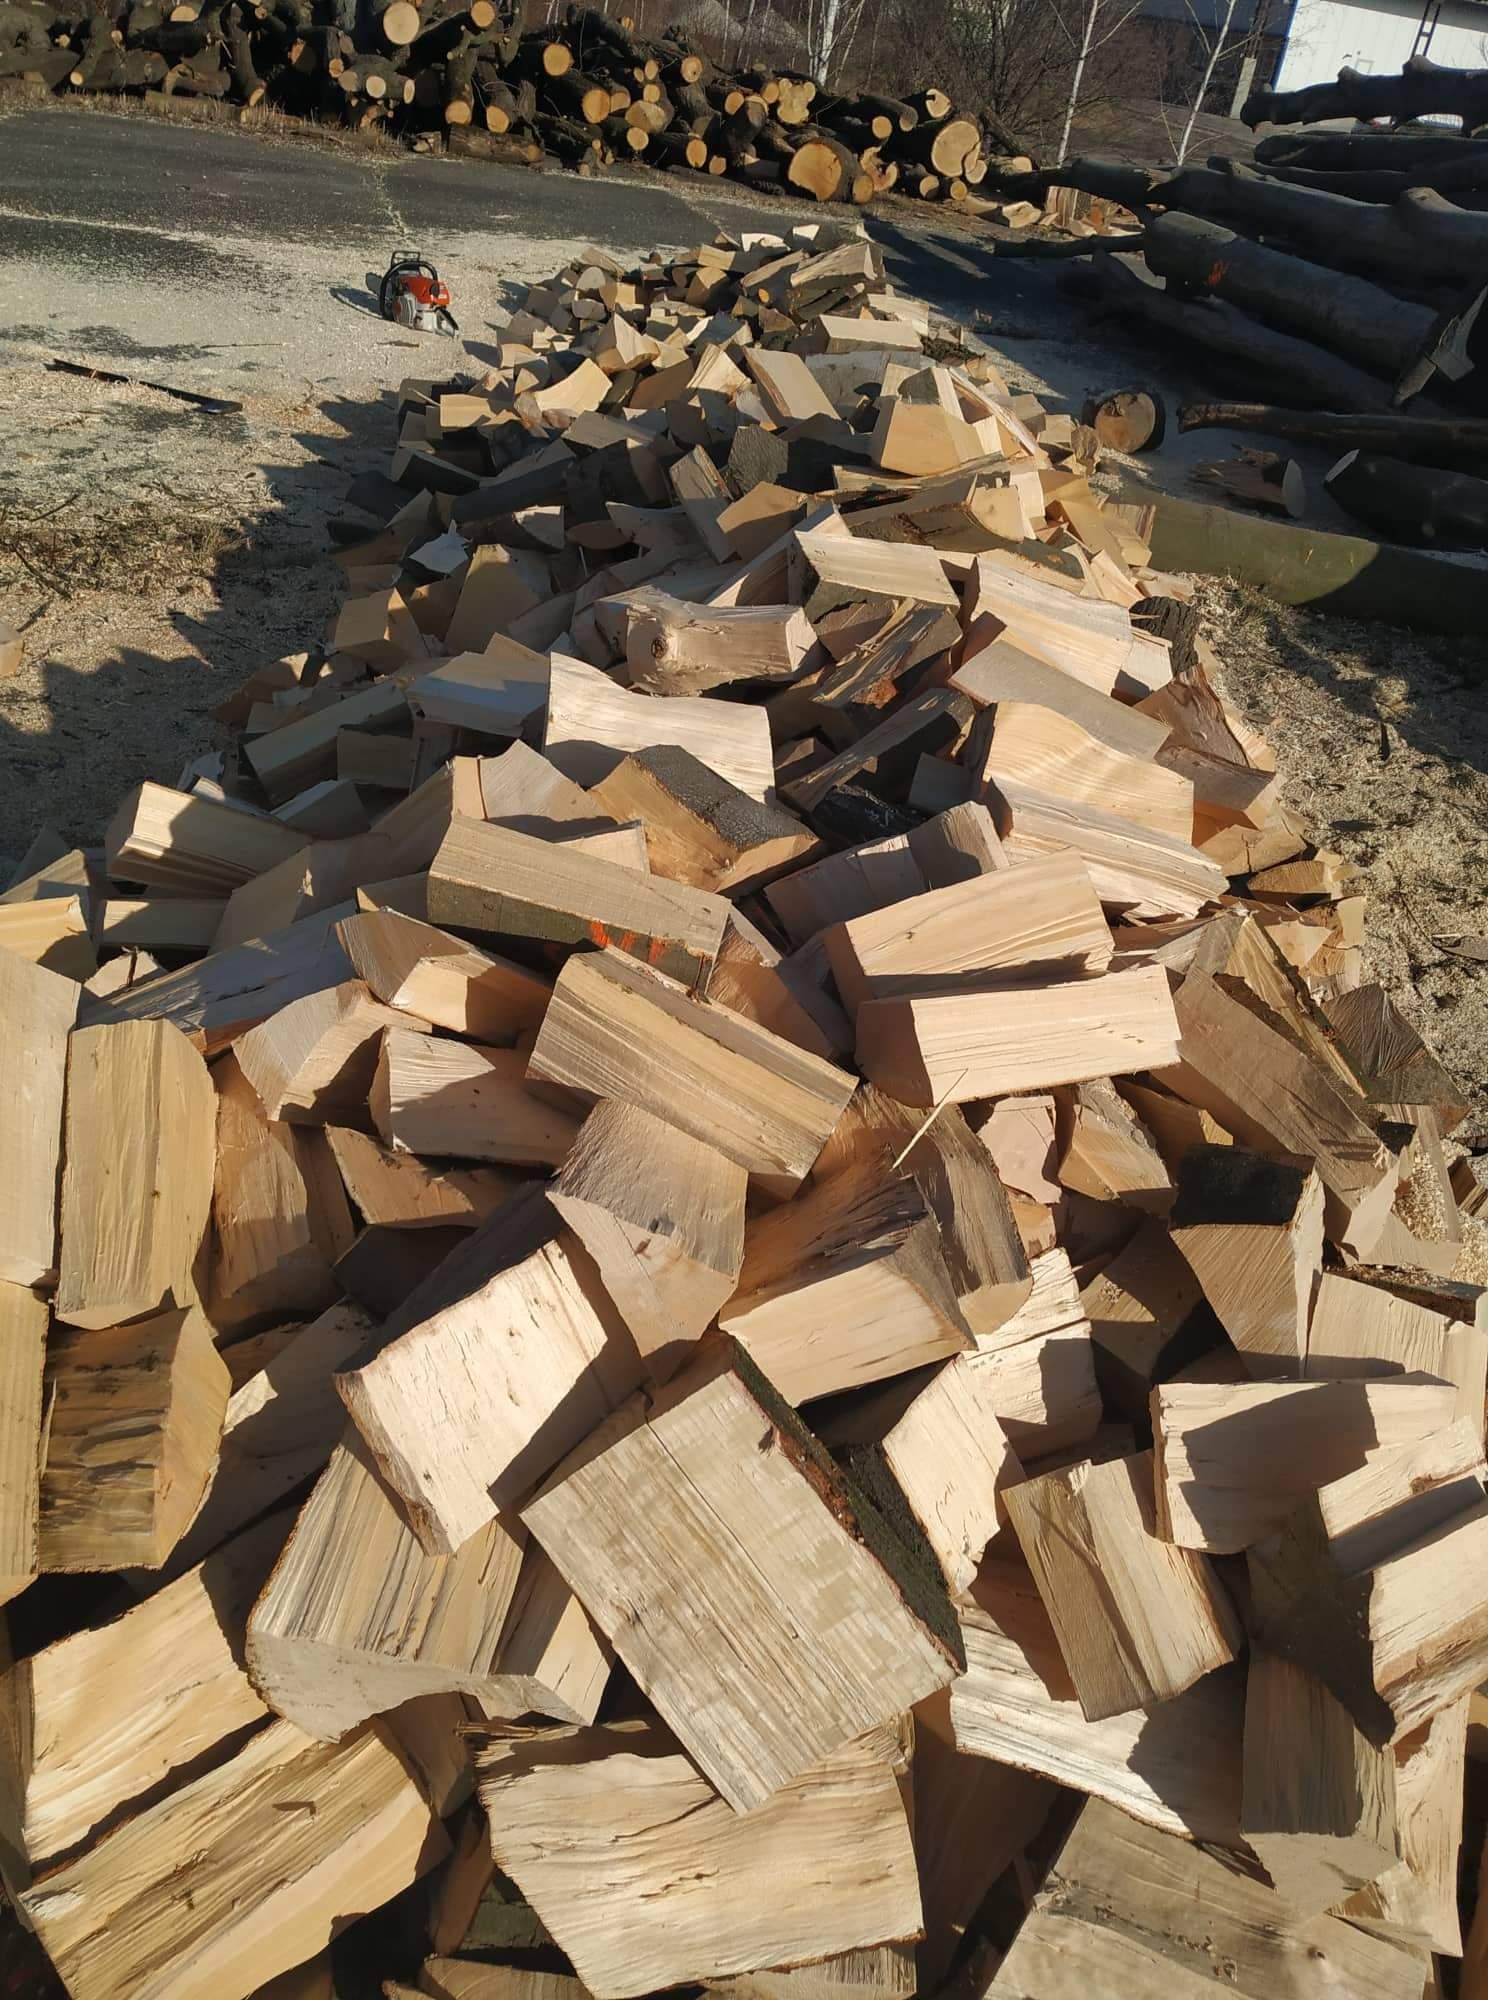 Soutěž o kontejner palivového dřeva - www.palivove-ostrava-drevo.cz